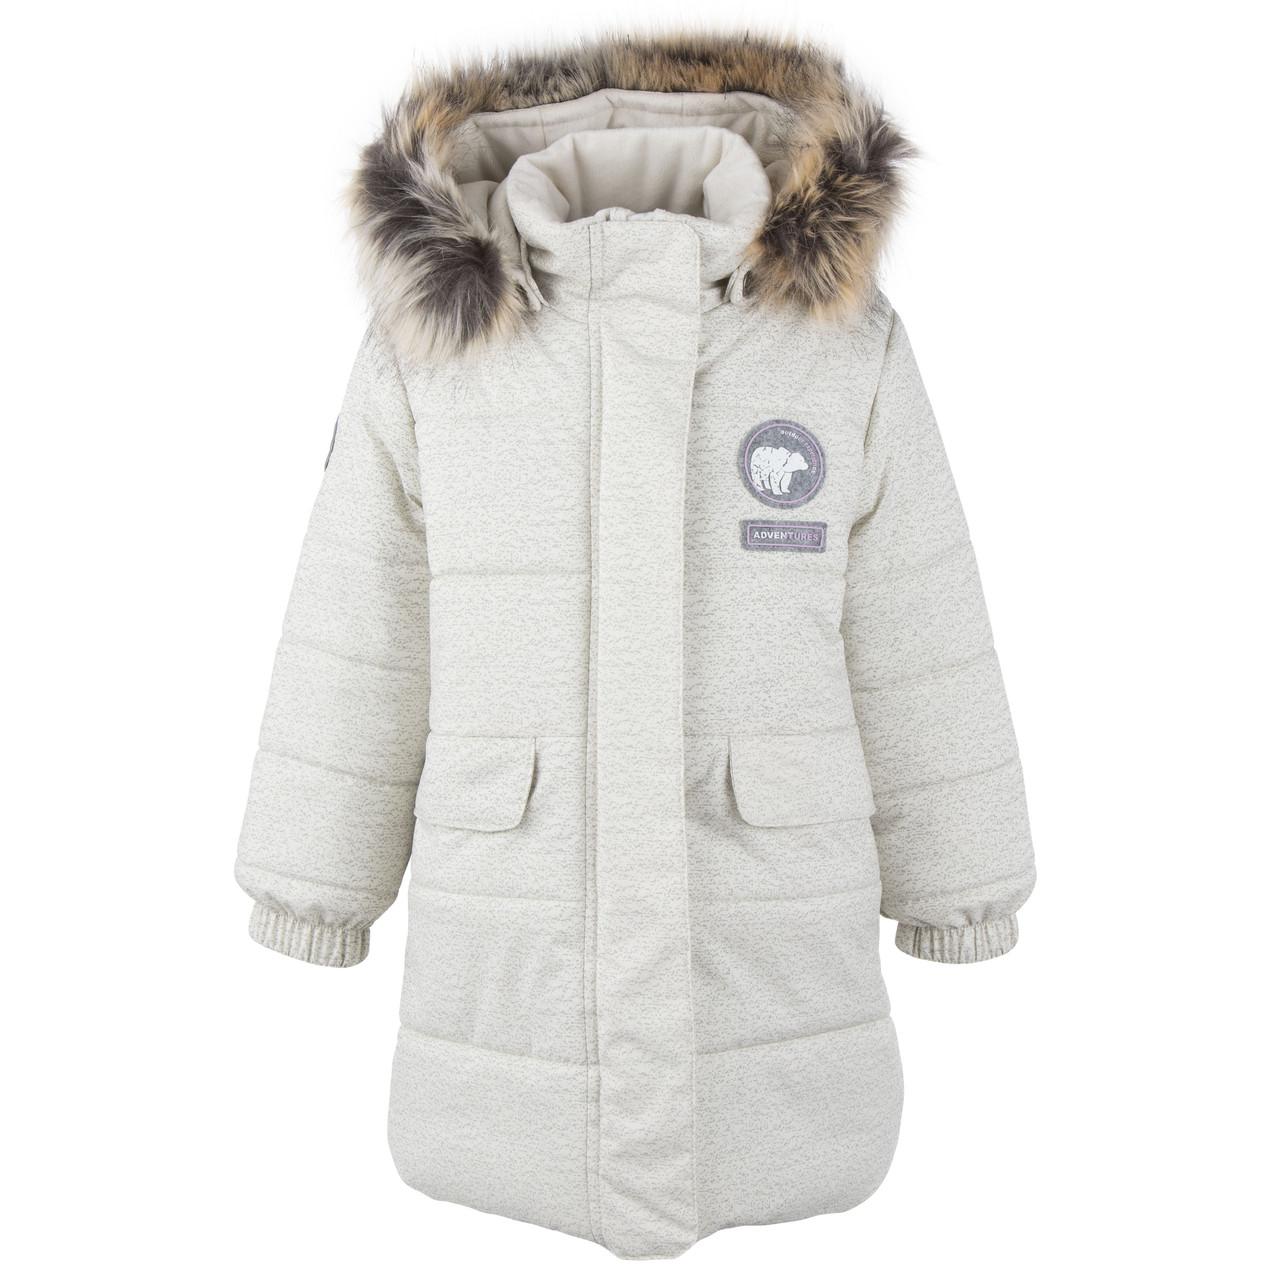 Пальто для девочек Kerry LEANNA